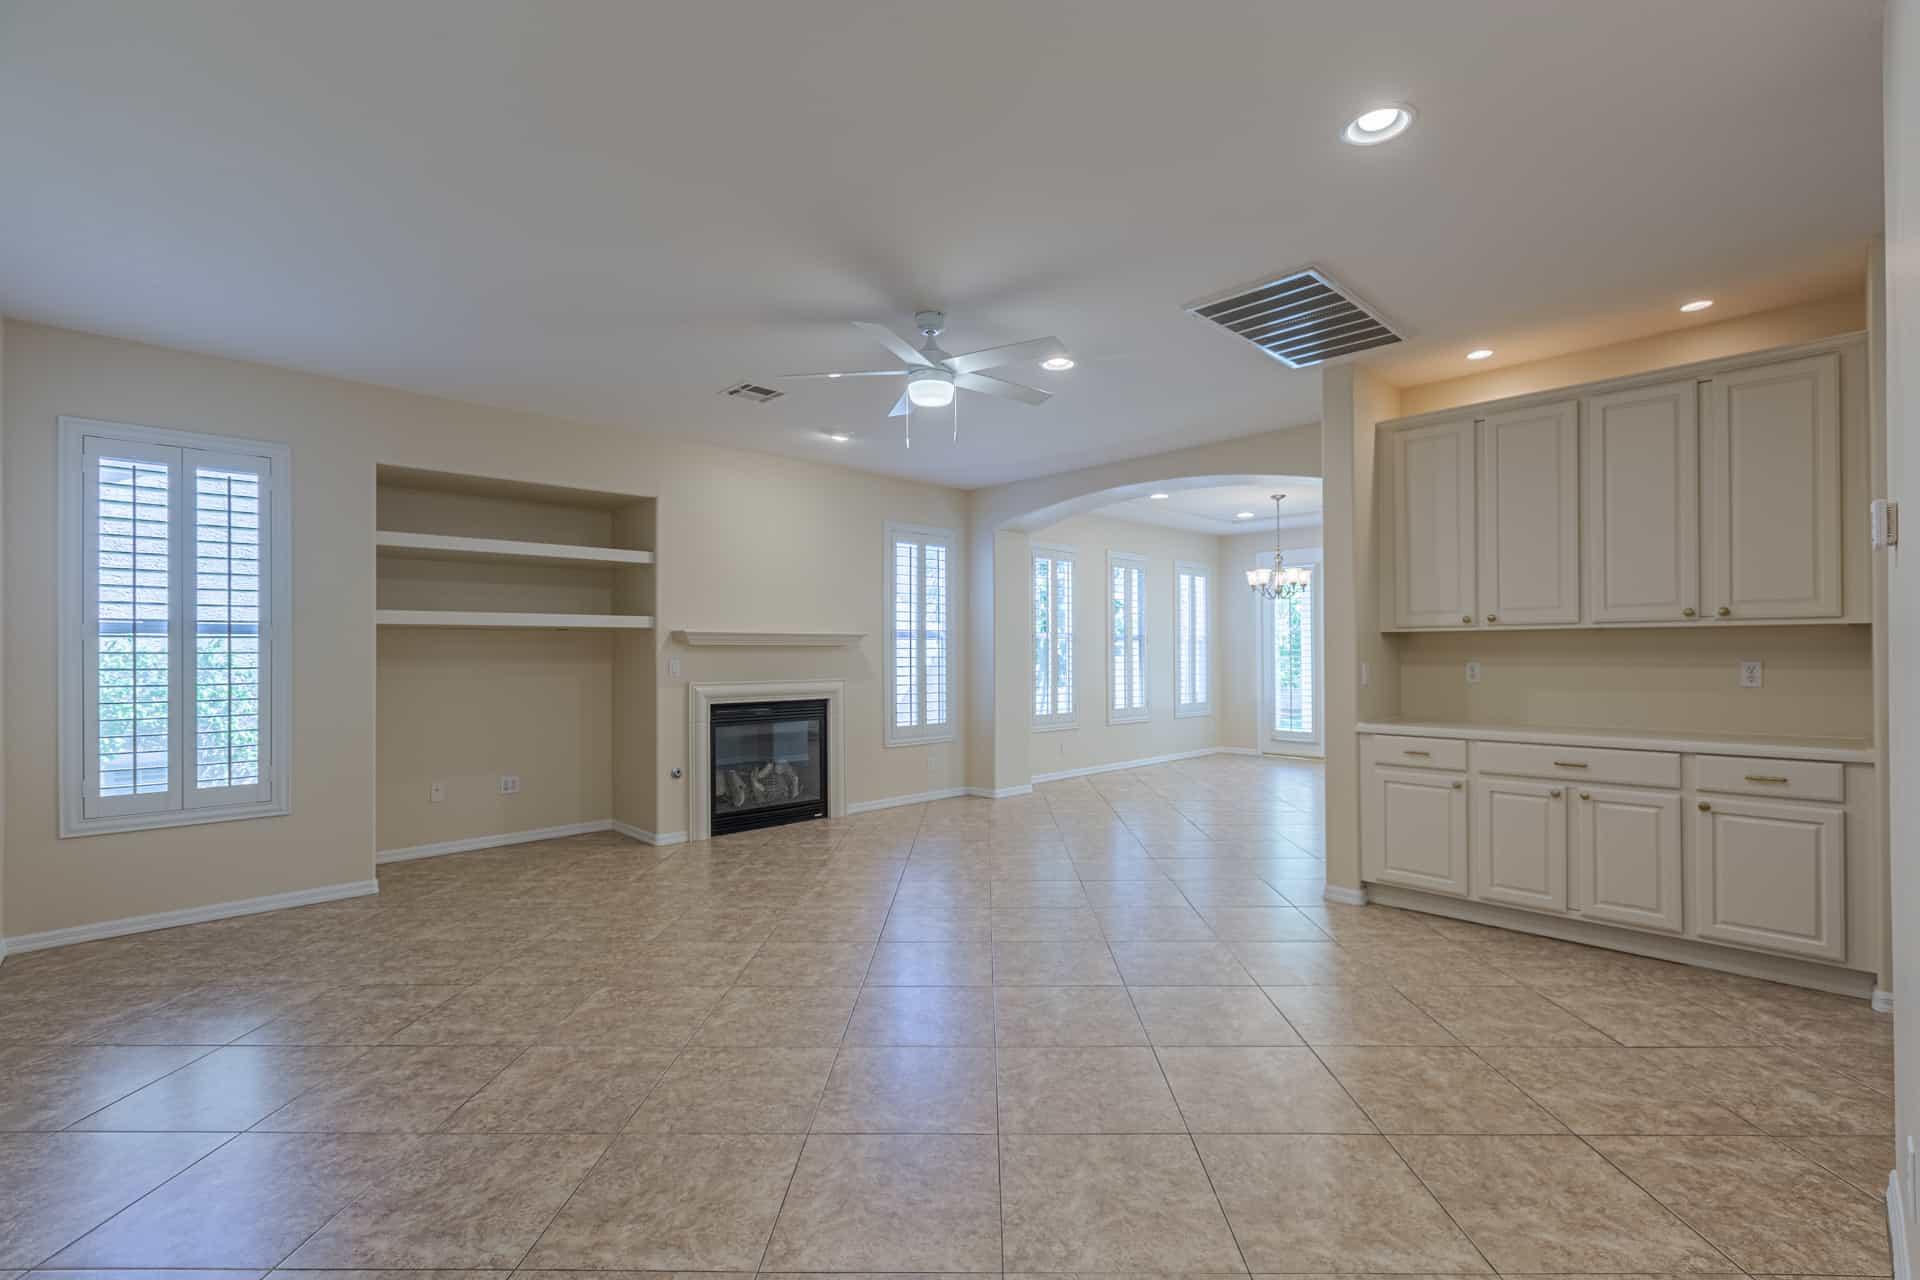 las-vegas-luxry-real-estate-realtor-rob-jensen-company-10729-grey-havens-court-willow-creek2557